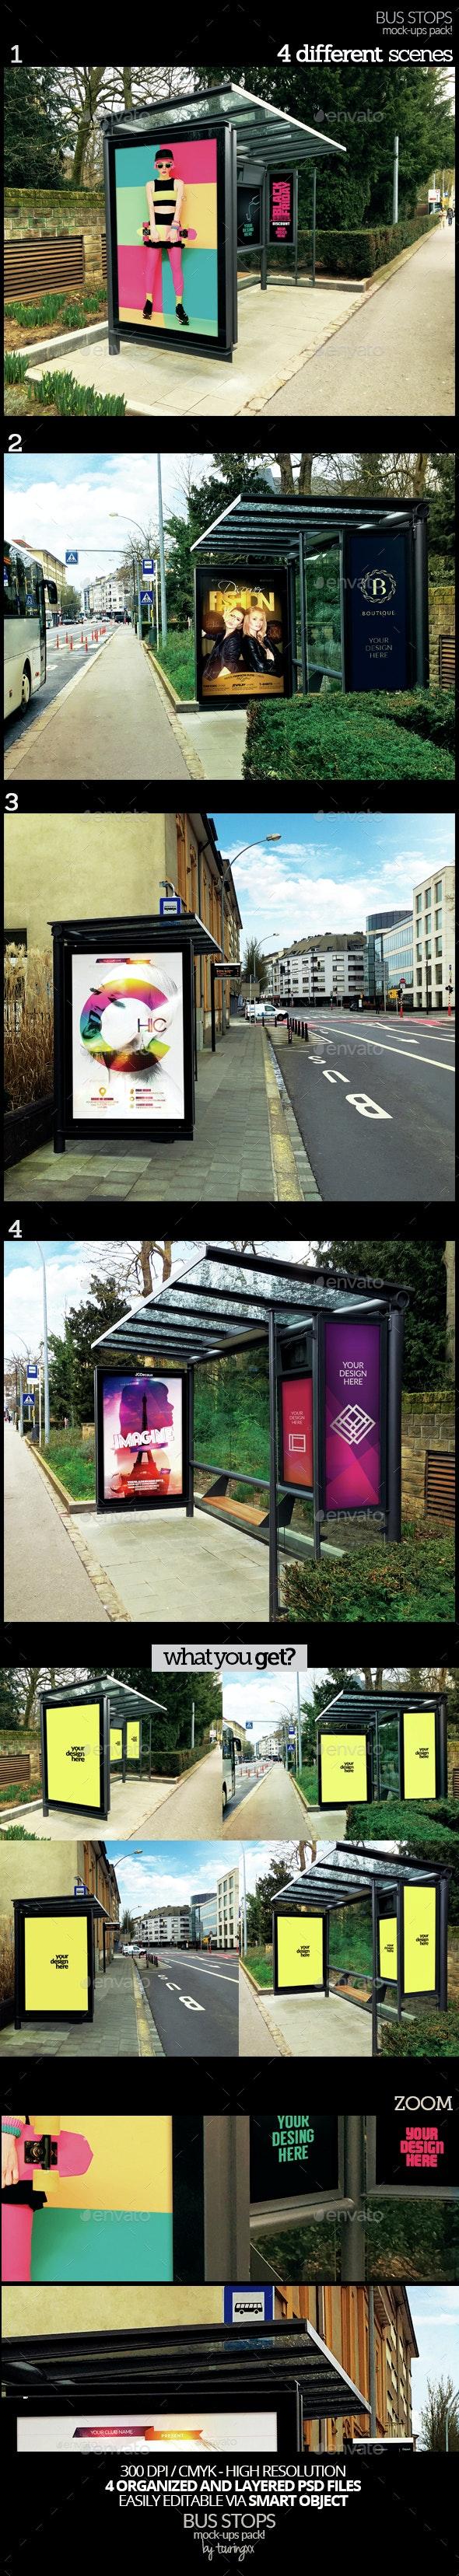 Bus Stops Mock-Ups Pack - Product Mock-Ups Graphics